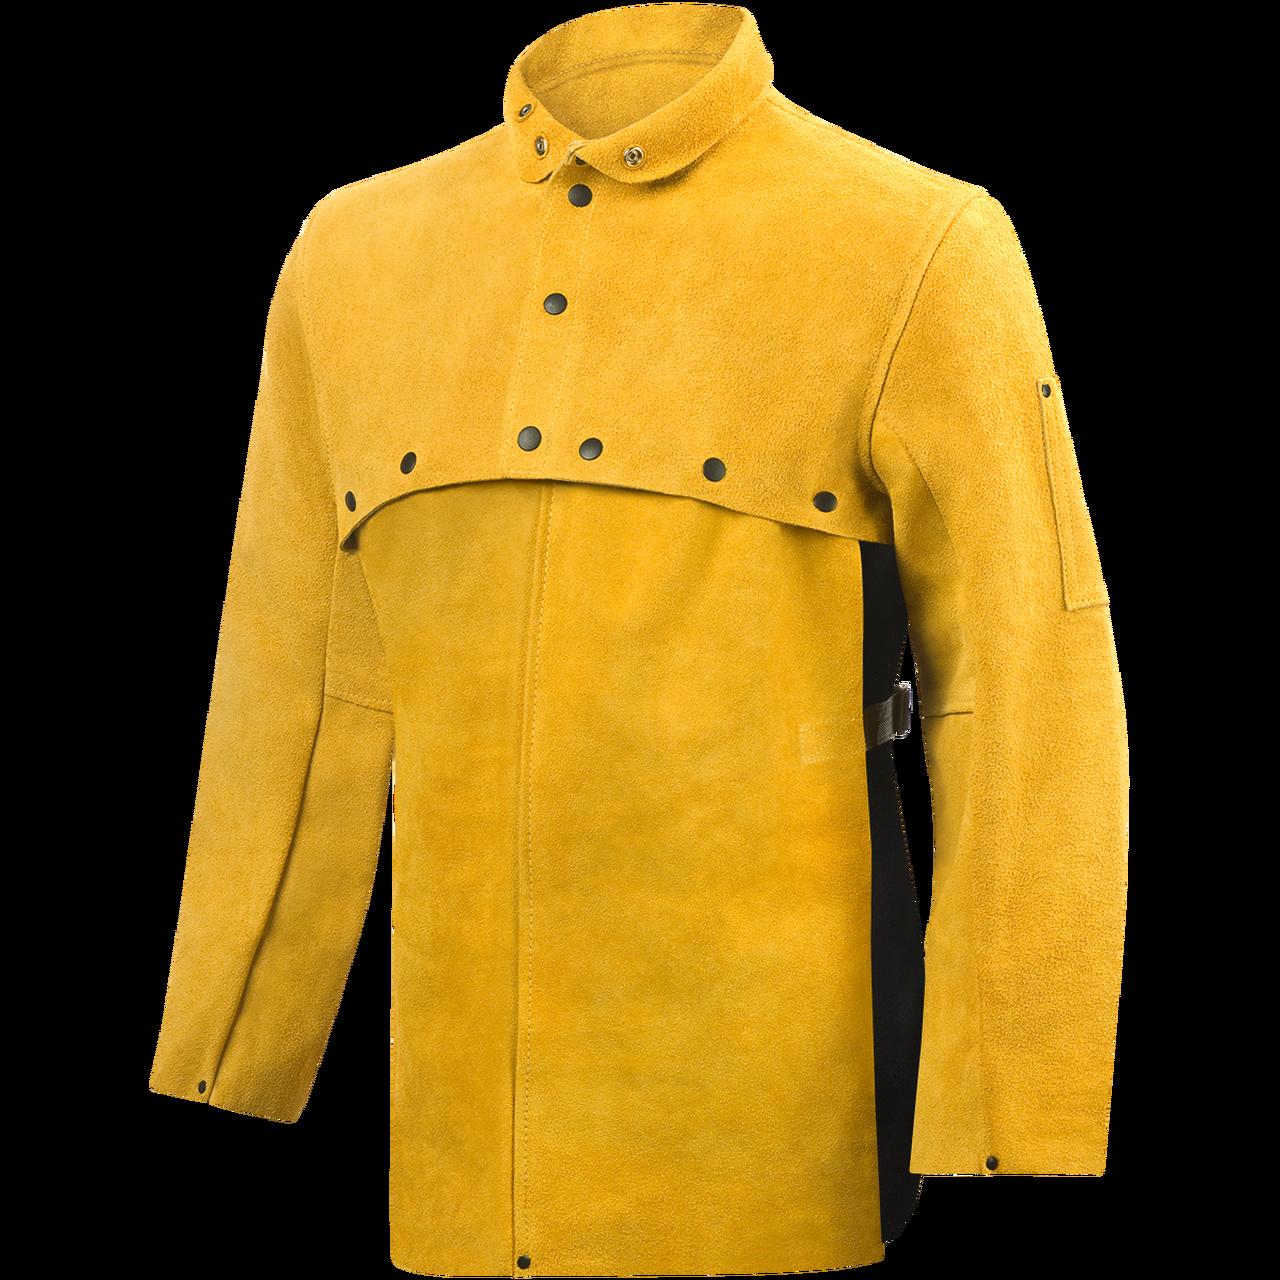 Leather Welding Apparel